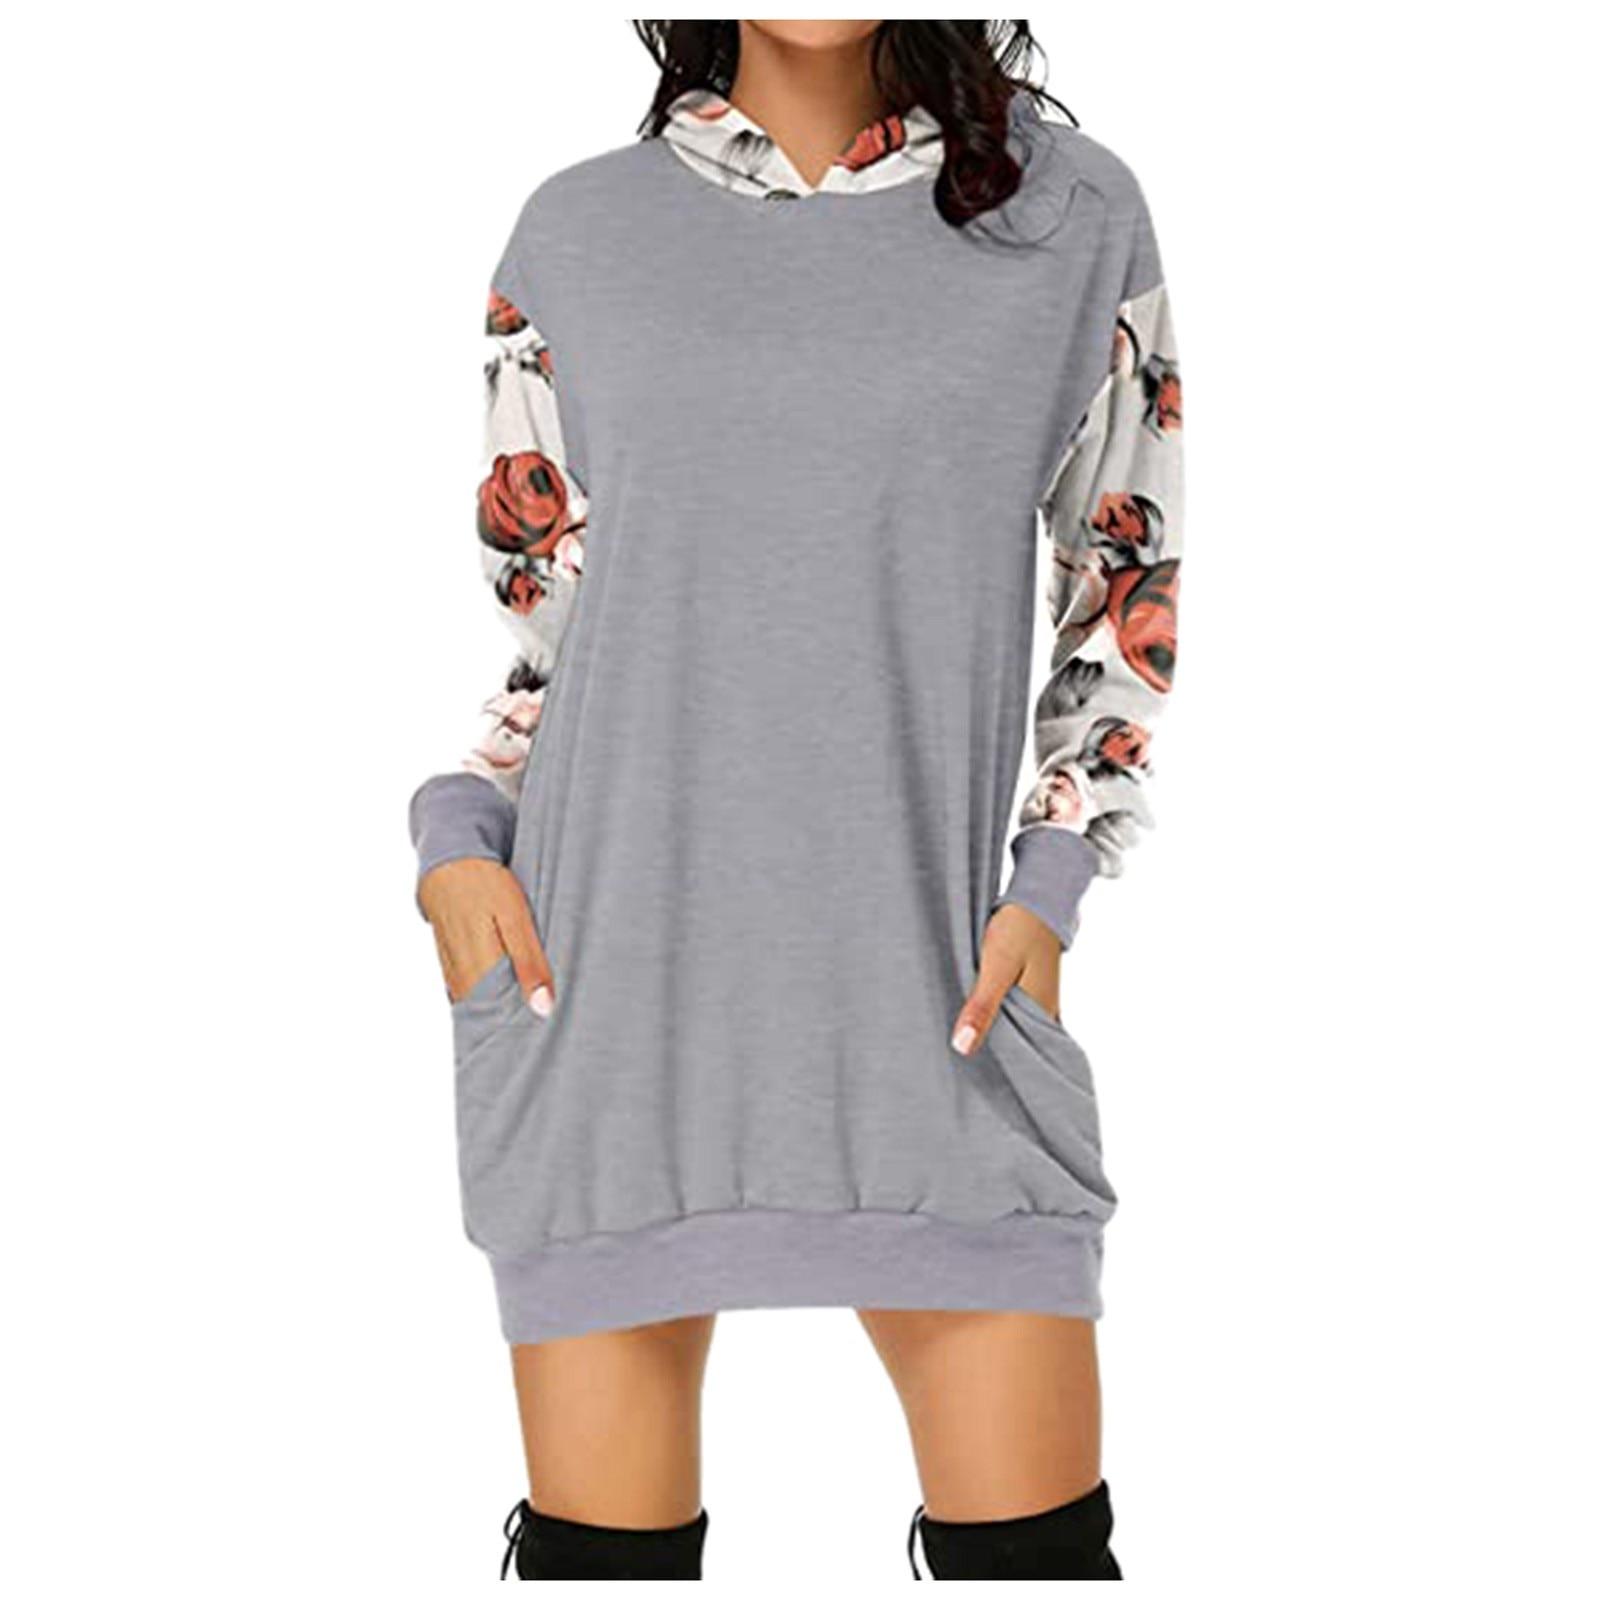 2021 Fashion Women Dresses Autumn Winter Elegant Floral Printed Jurk Hooded Pockets Short Female Sweatshirt Dress Femme #t2g 7